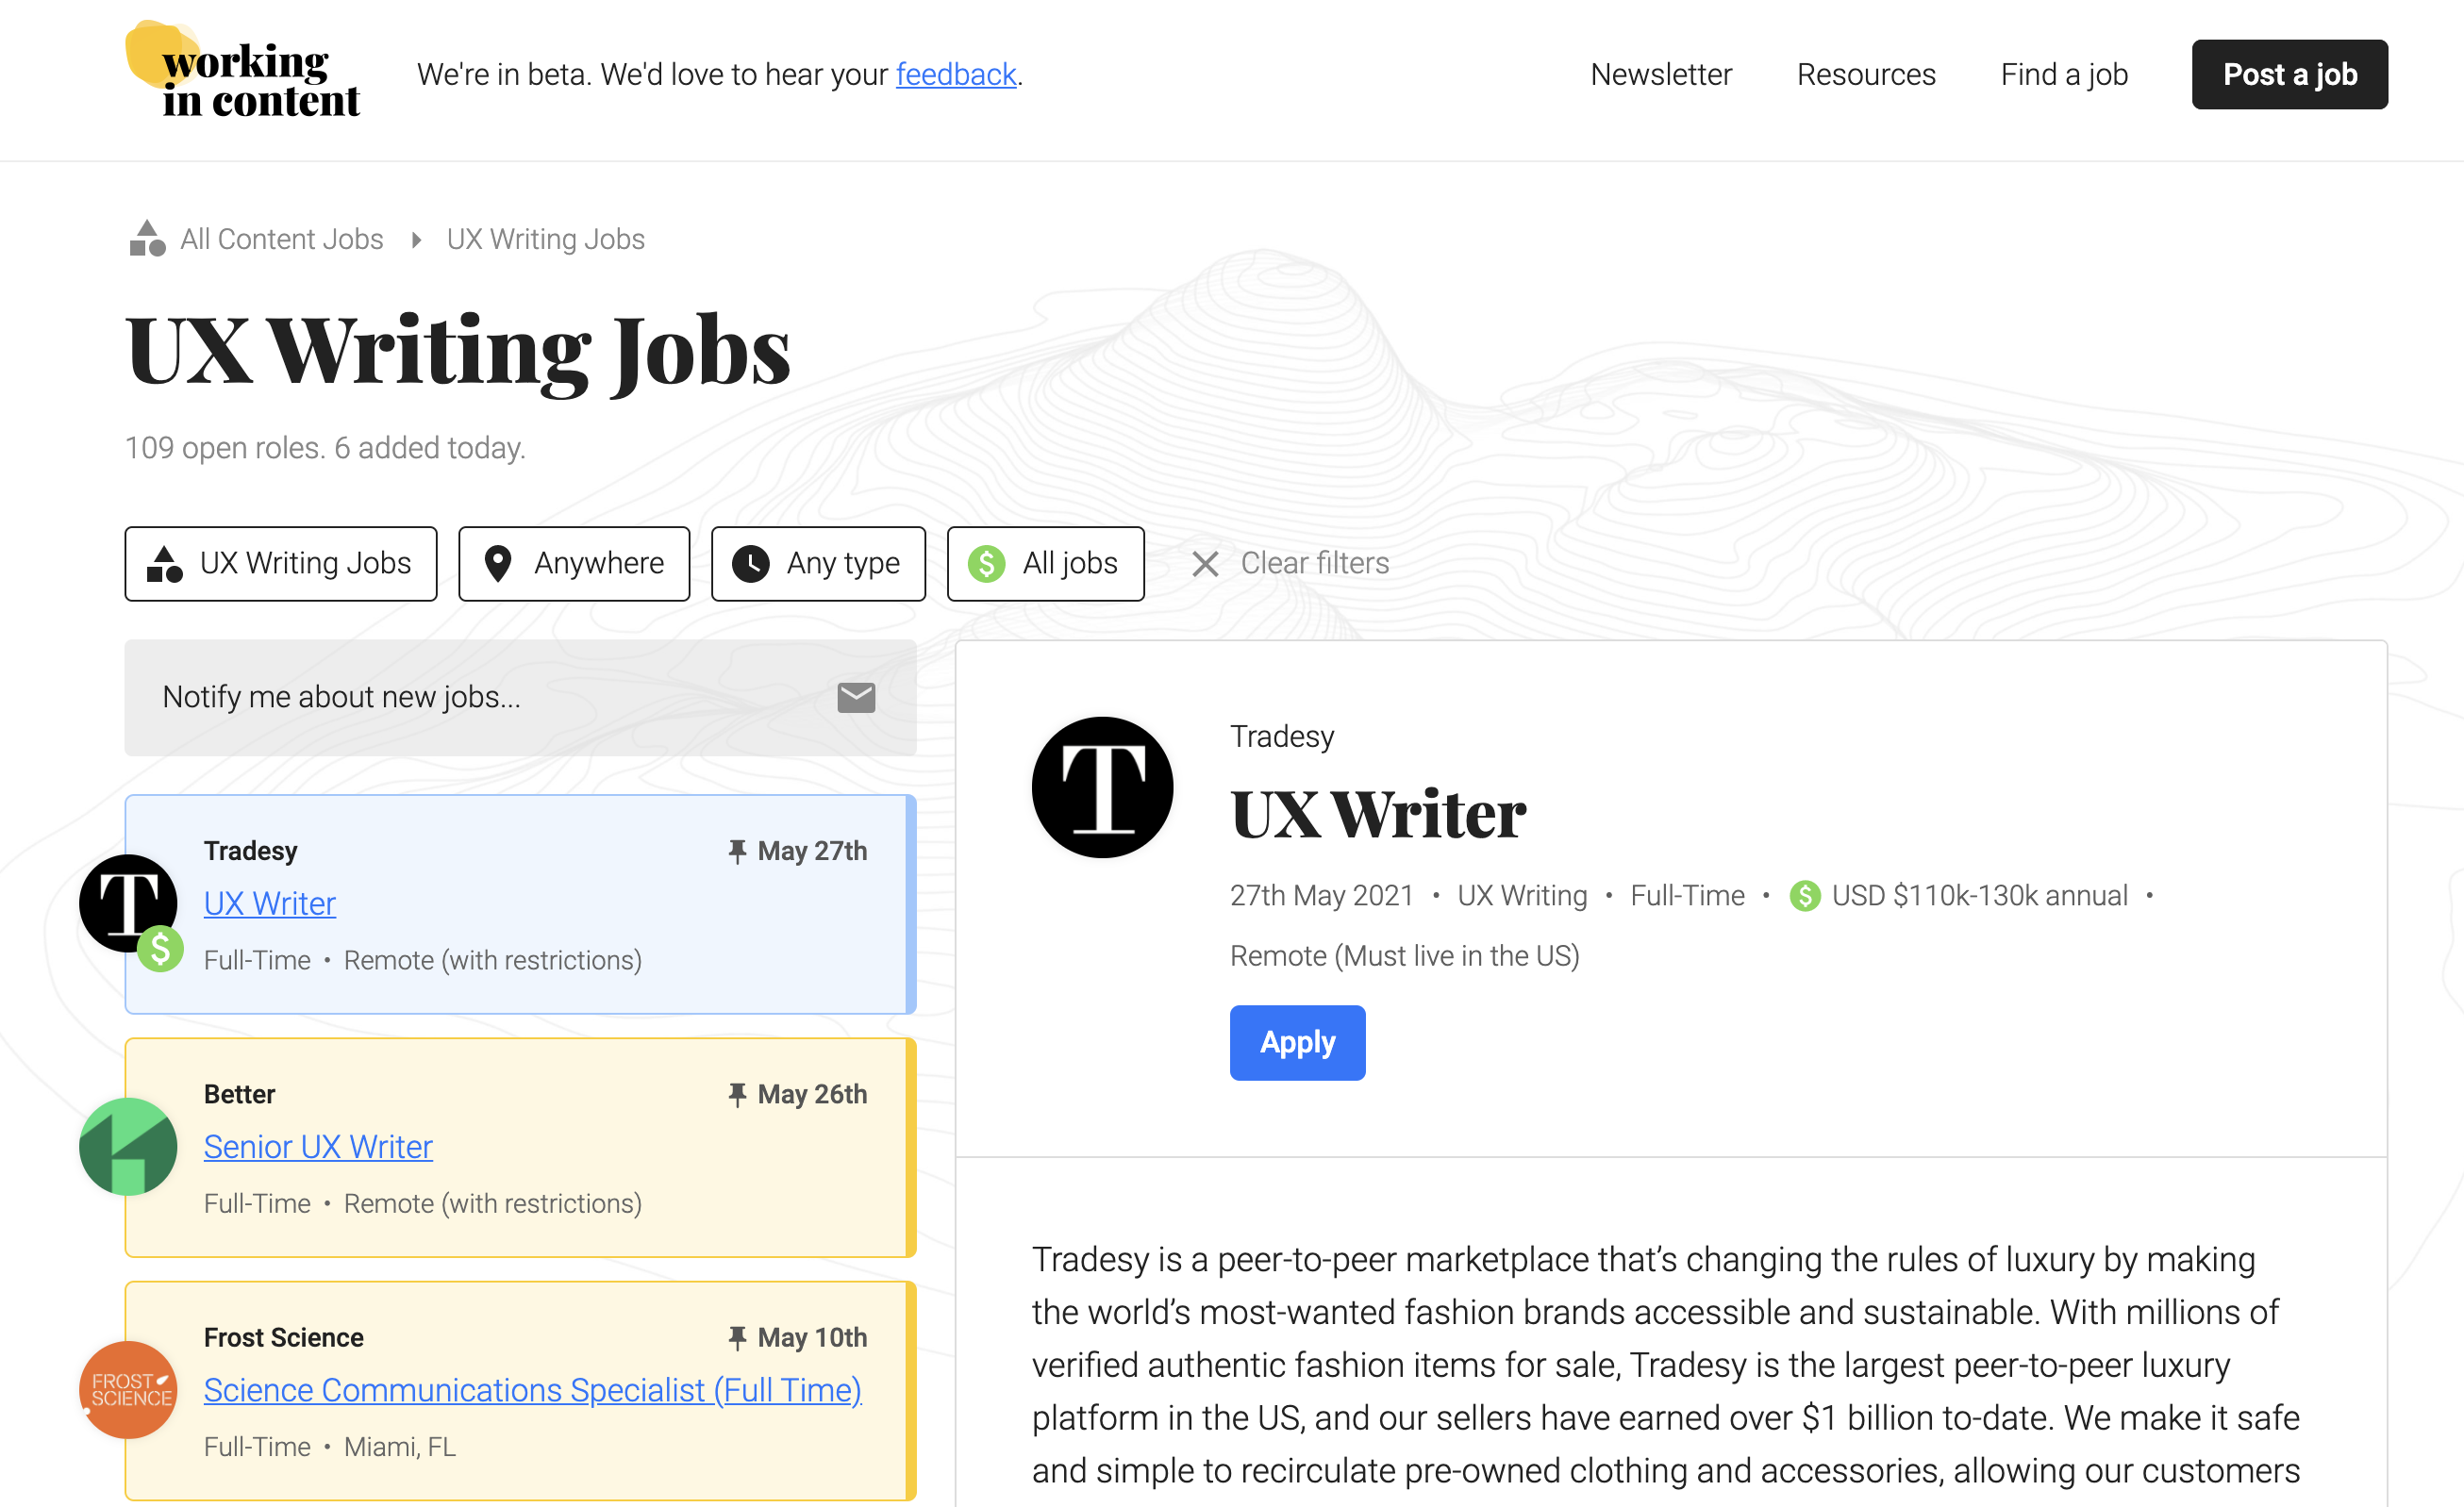 freelance writing niches - ux writer